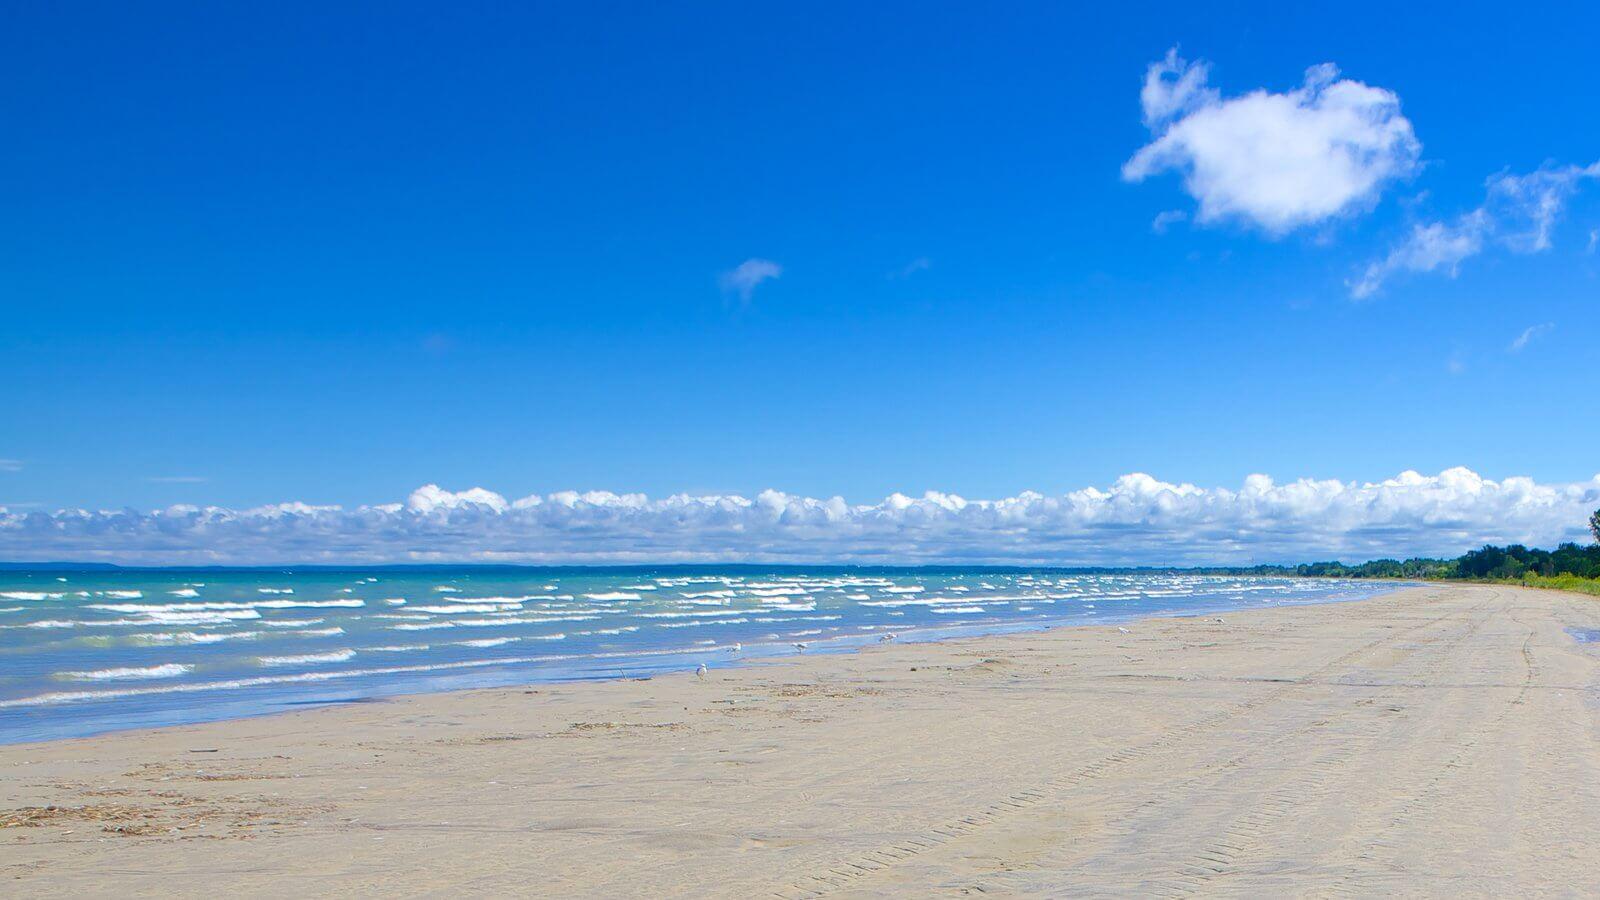 Wasaga Beach - Wasaga Beach Provincial Park,